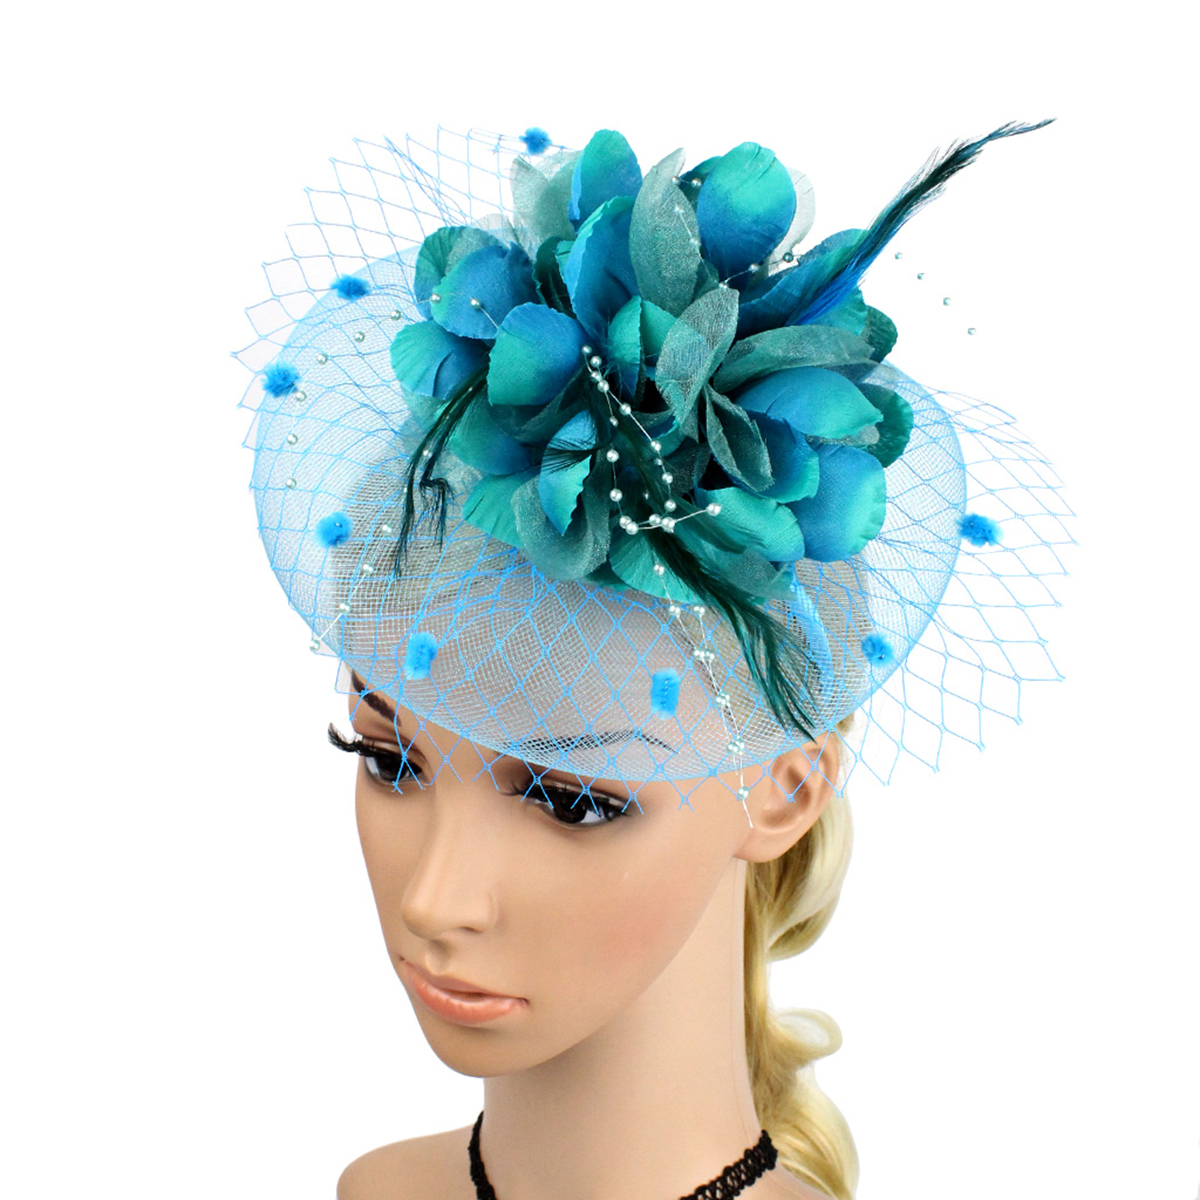 MUSEYA Feather Flower Net Hairpin Bride Headdress Bridal Feather Hairclip Wedding Headpiece Cocktail Party Headwear headpiece